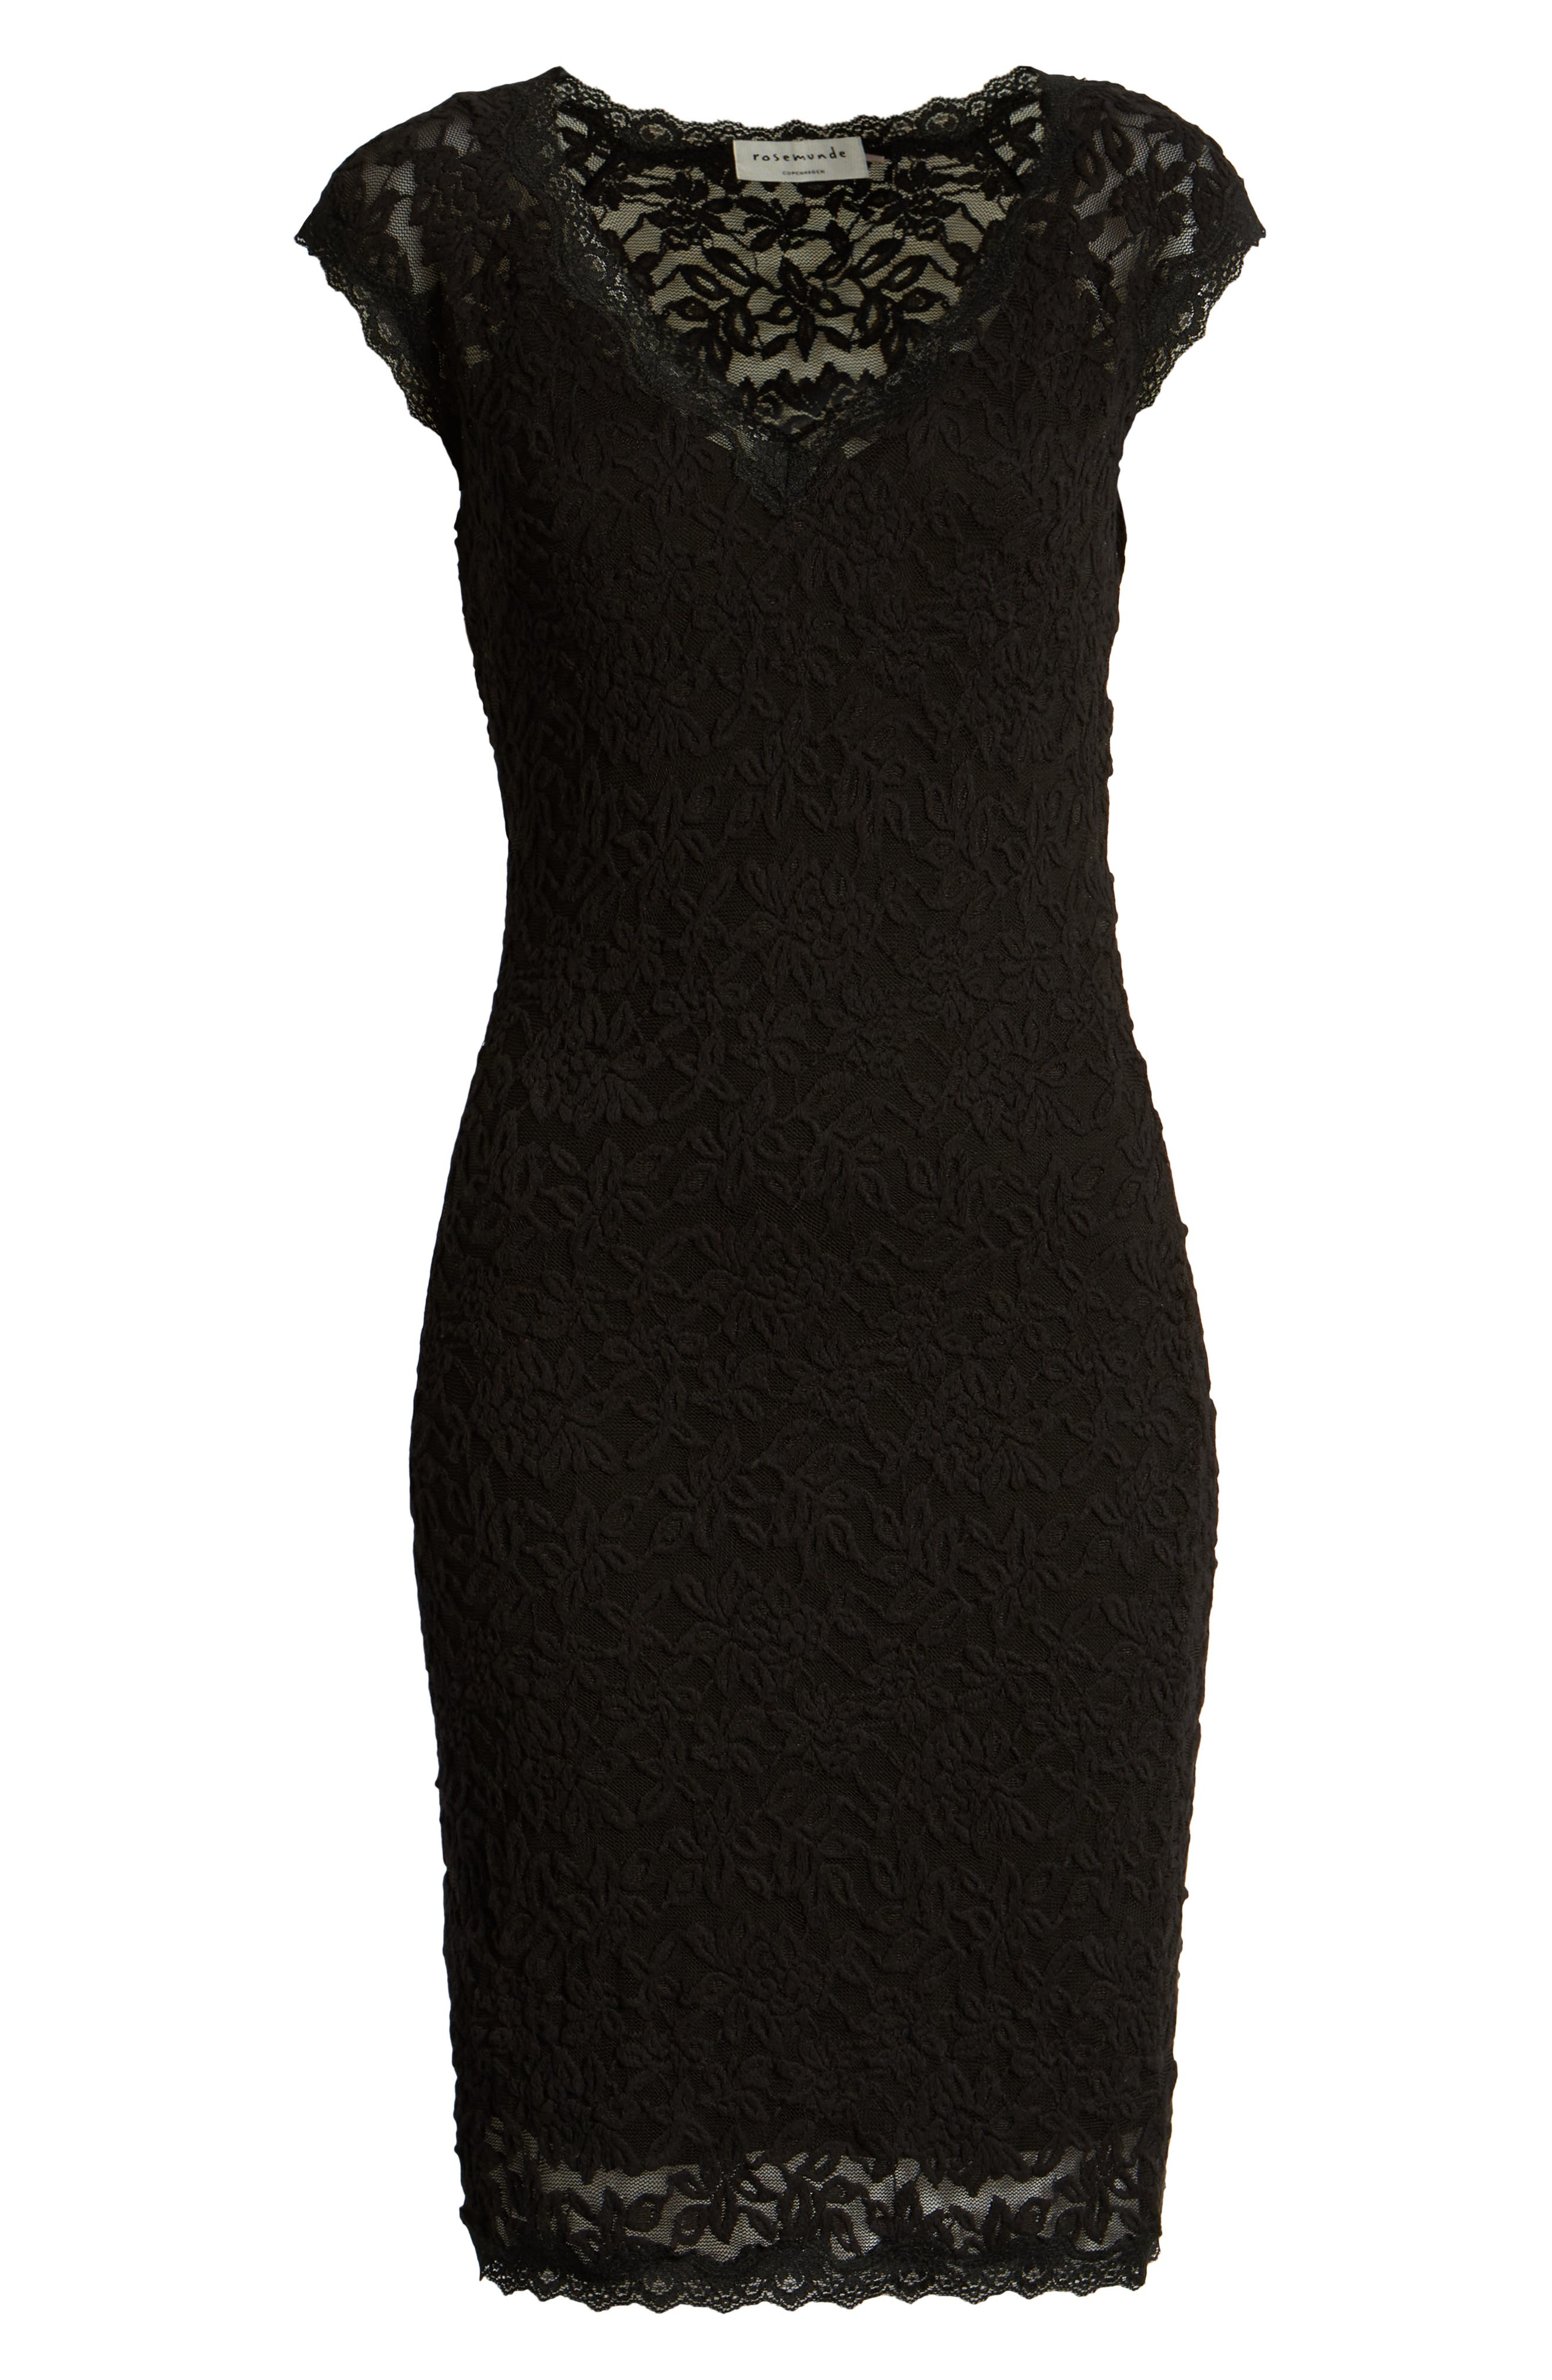 ROSEMUNDE, Delicia V-Neck Dress, Alternate thumbnail 7, color, BLACK